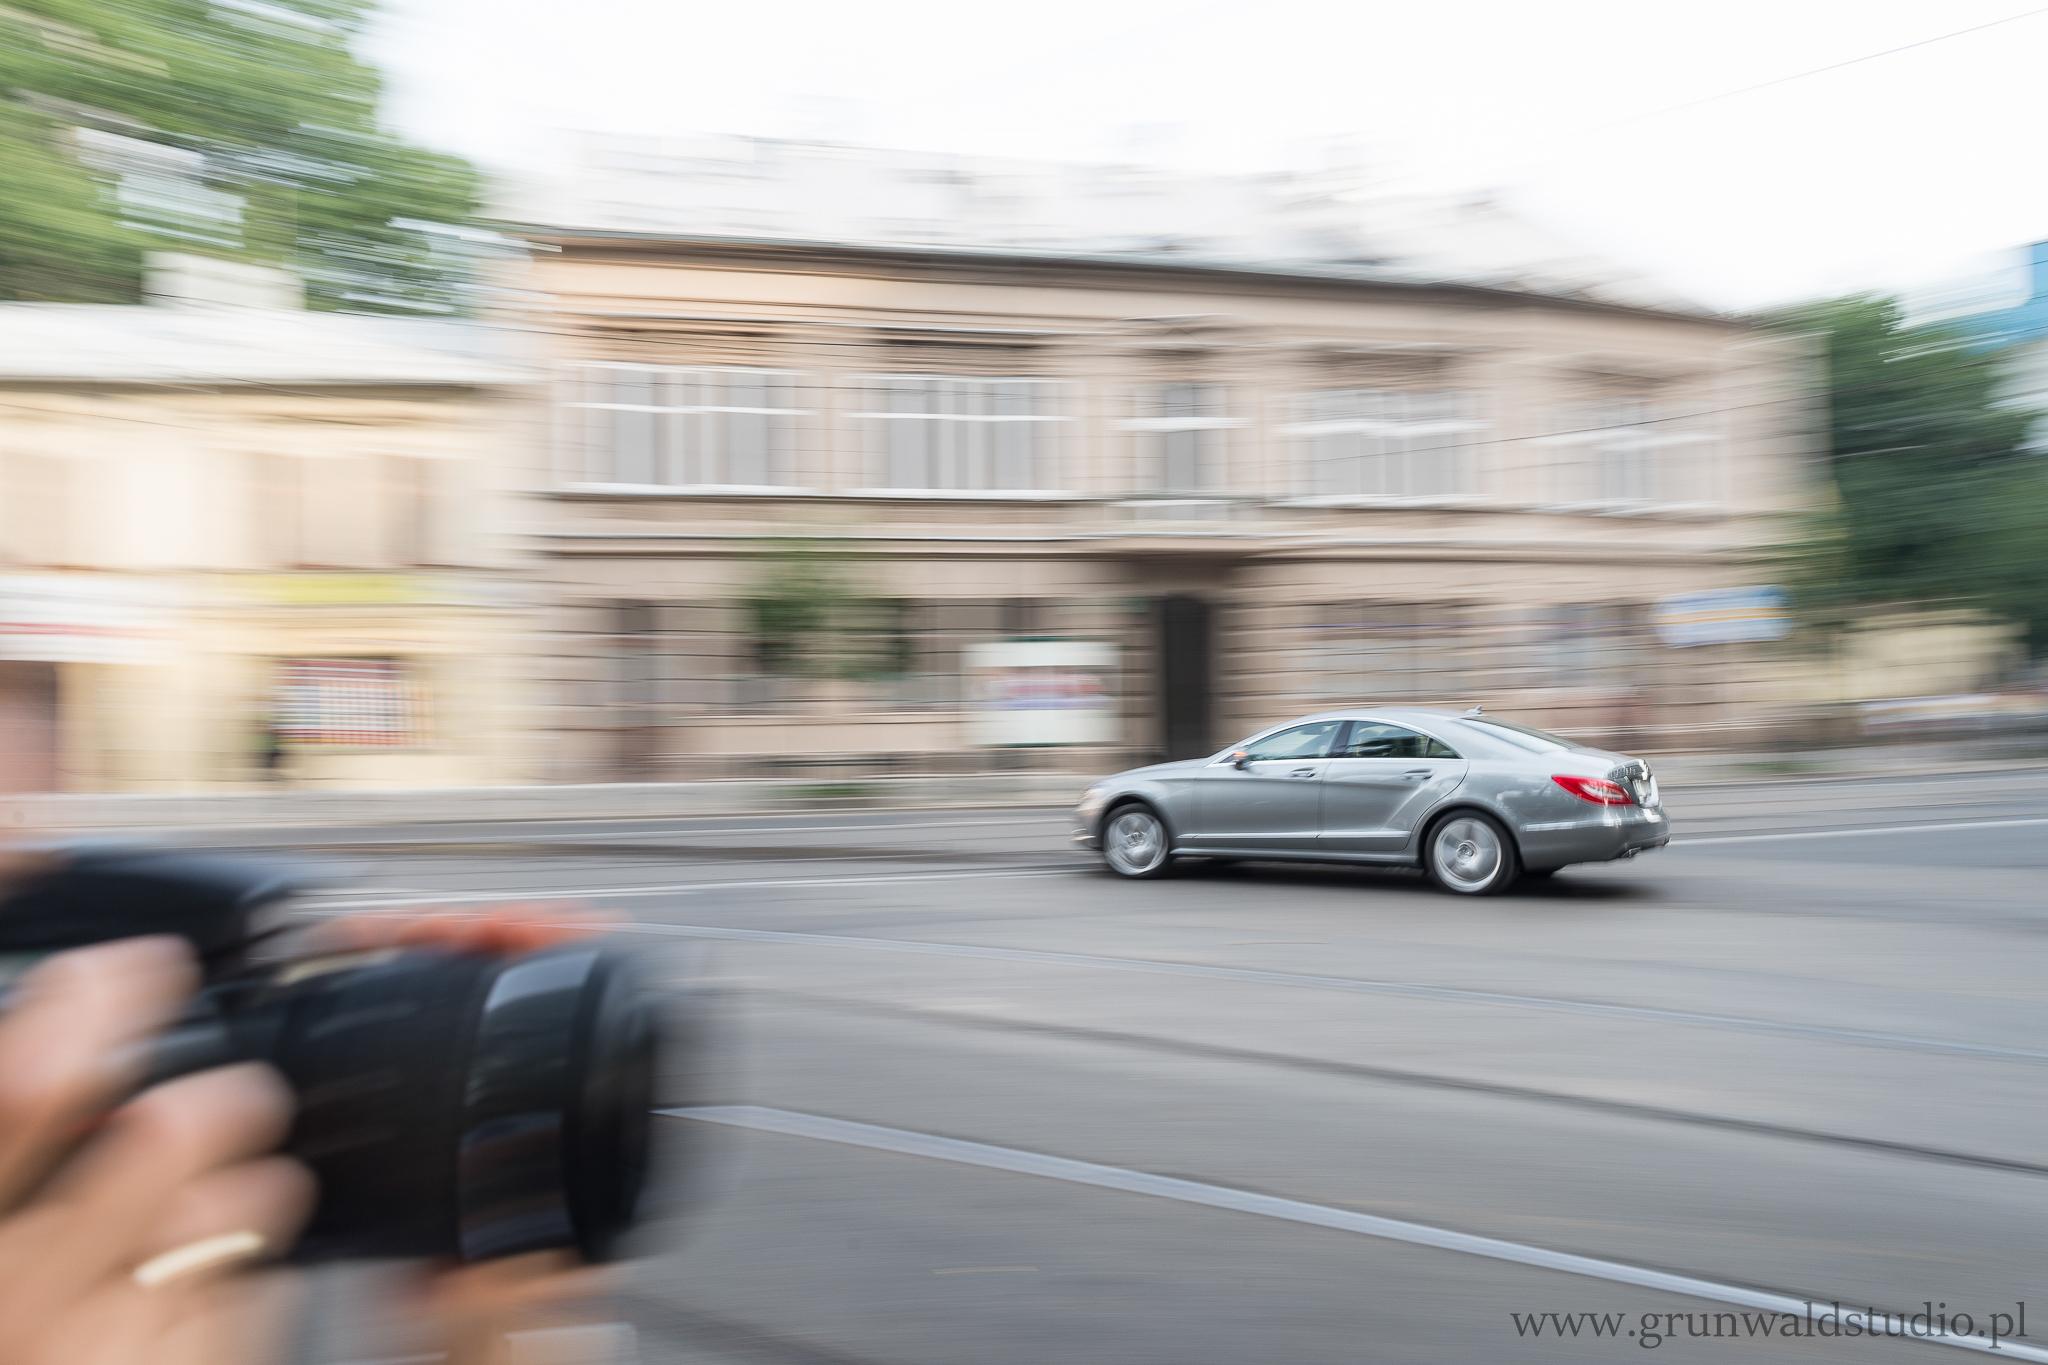 grunwald-studio-kursy-fotografii-krakow-10-of-18